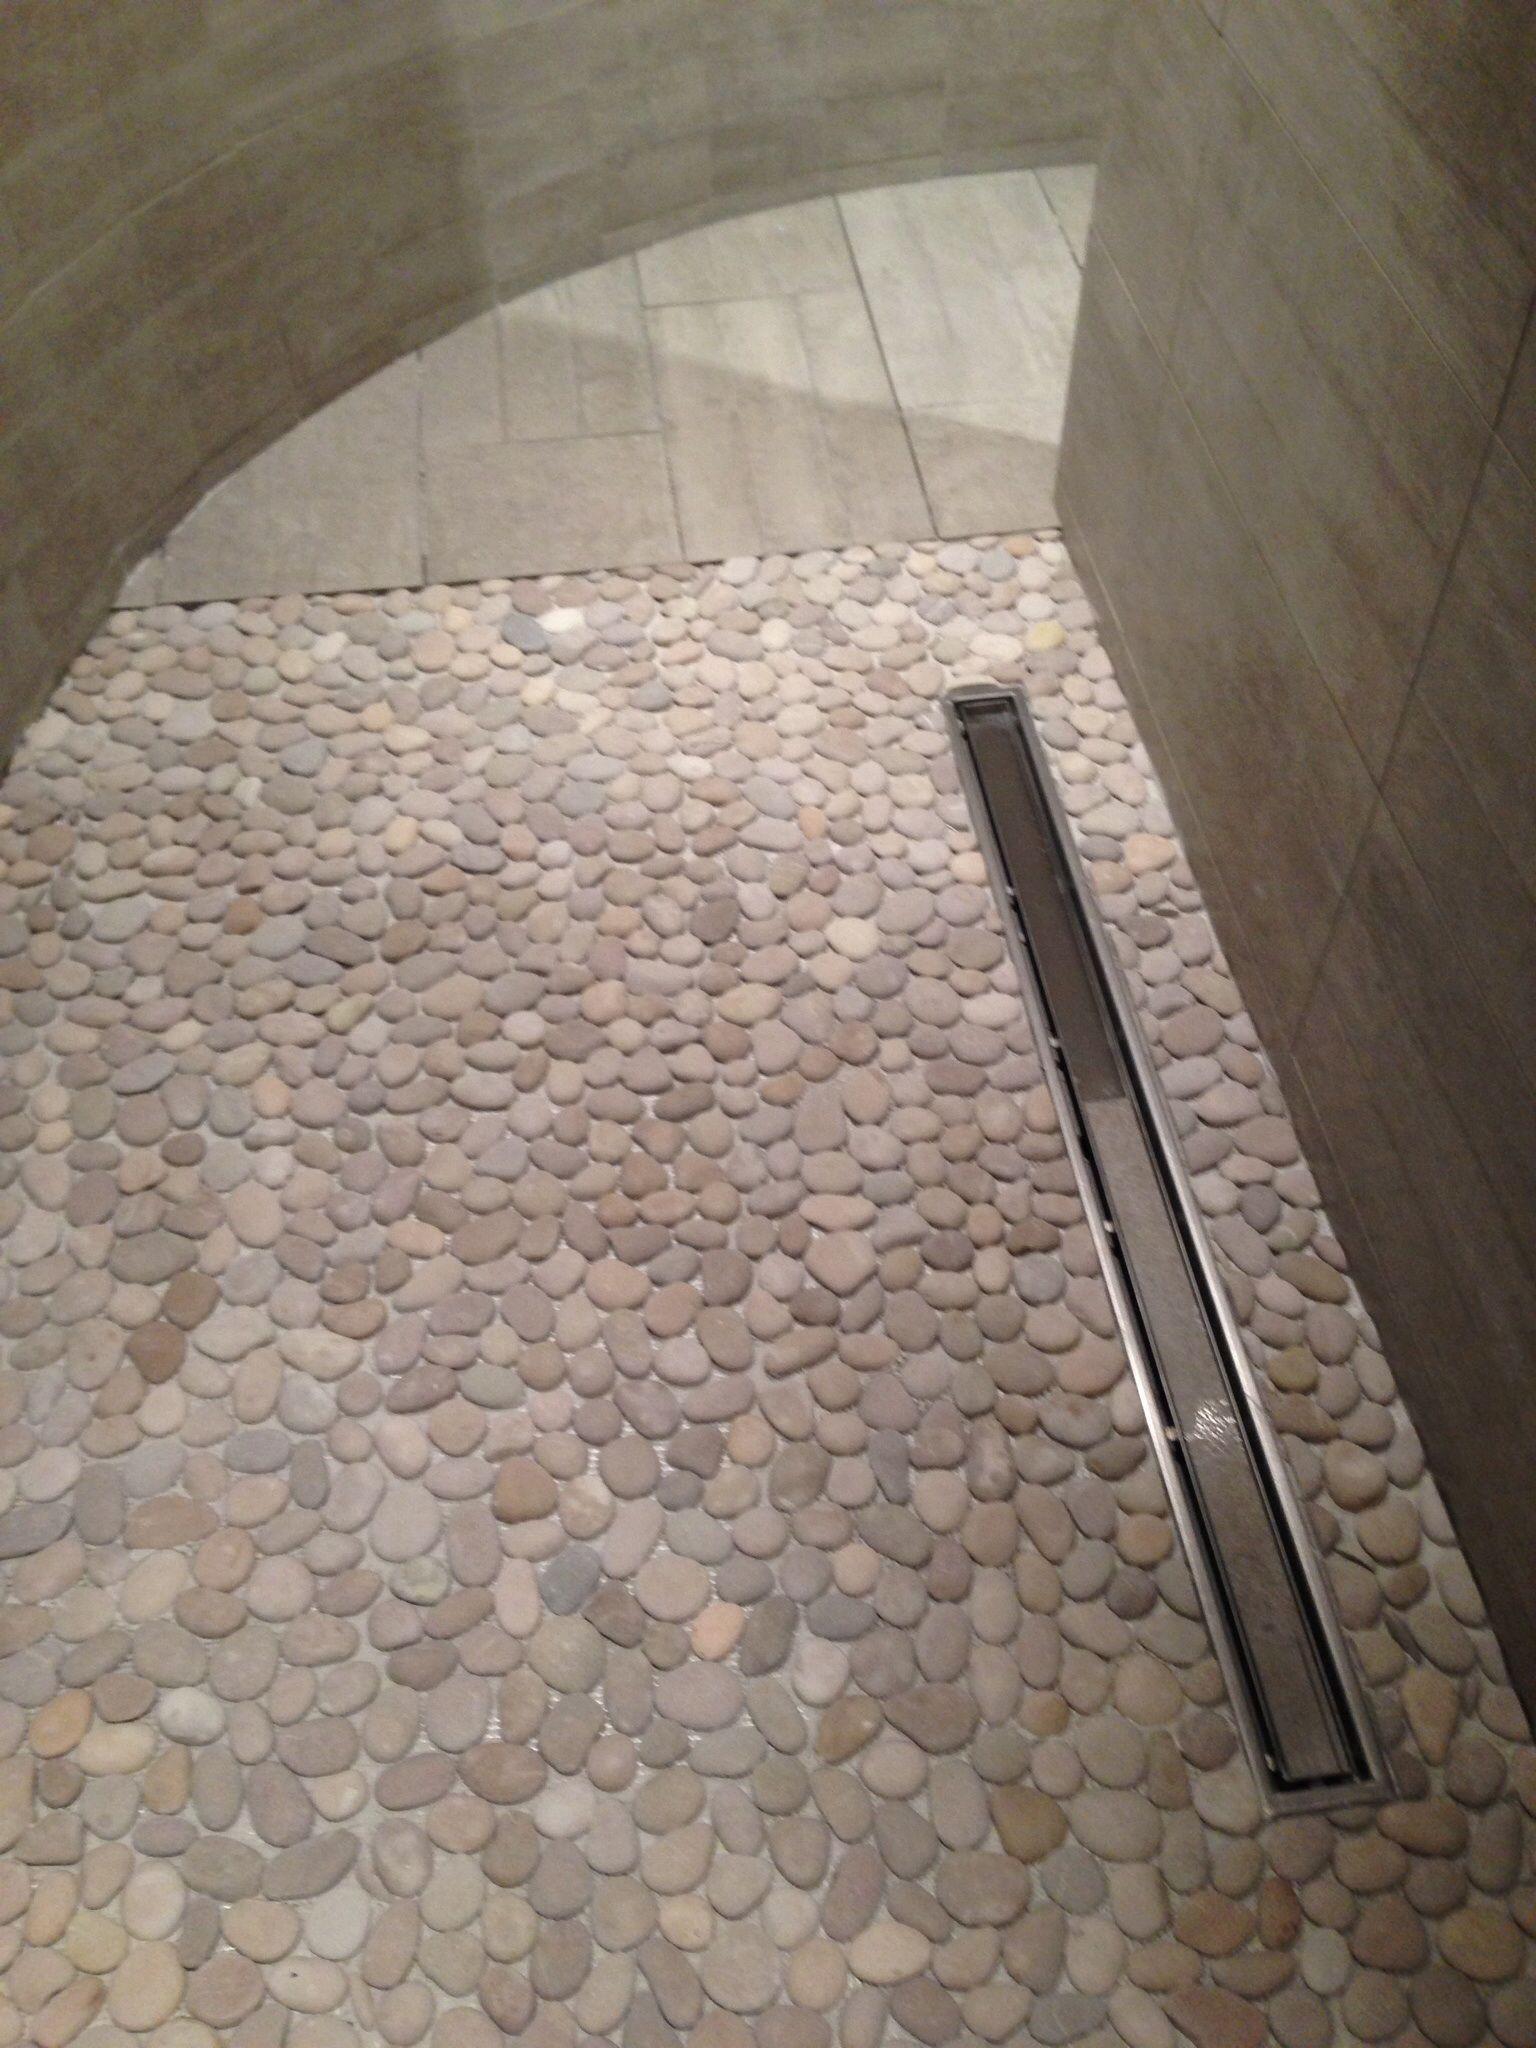 Pebble Mosaic Shower Floor Linear Drain Large Format Porcelain Tile Shower Floor Pebble Shower Floor Bathroom Shower Tile